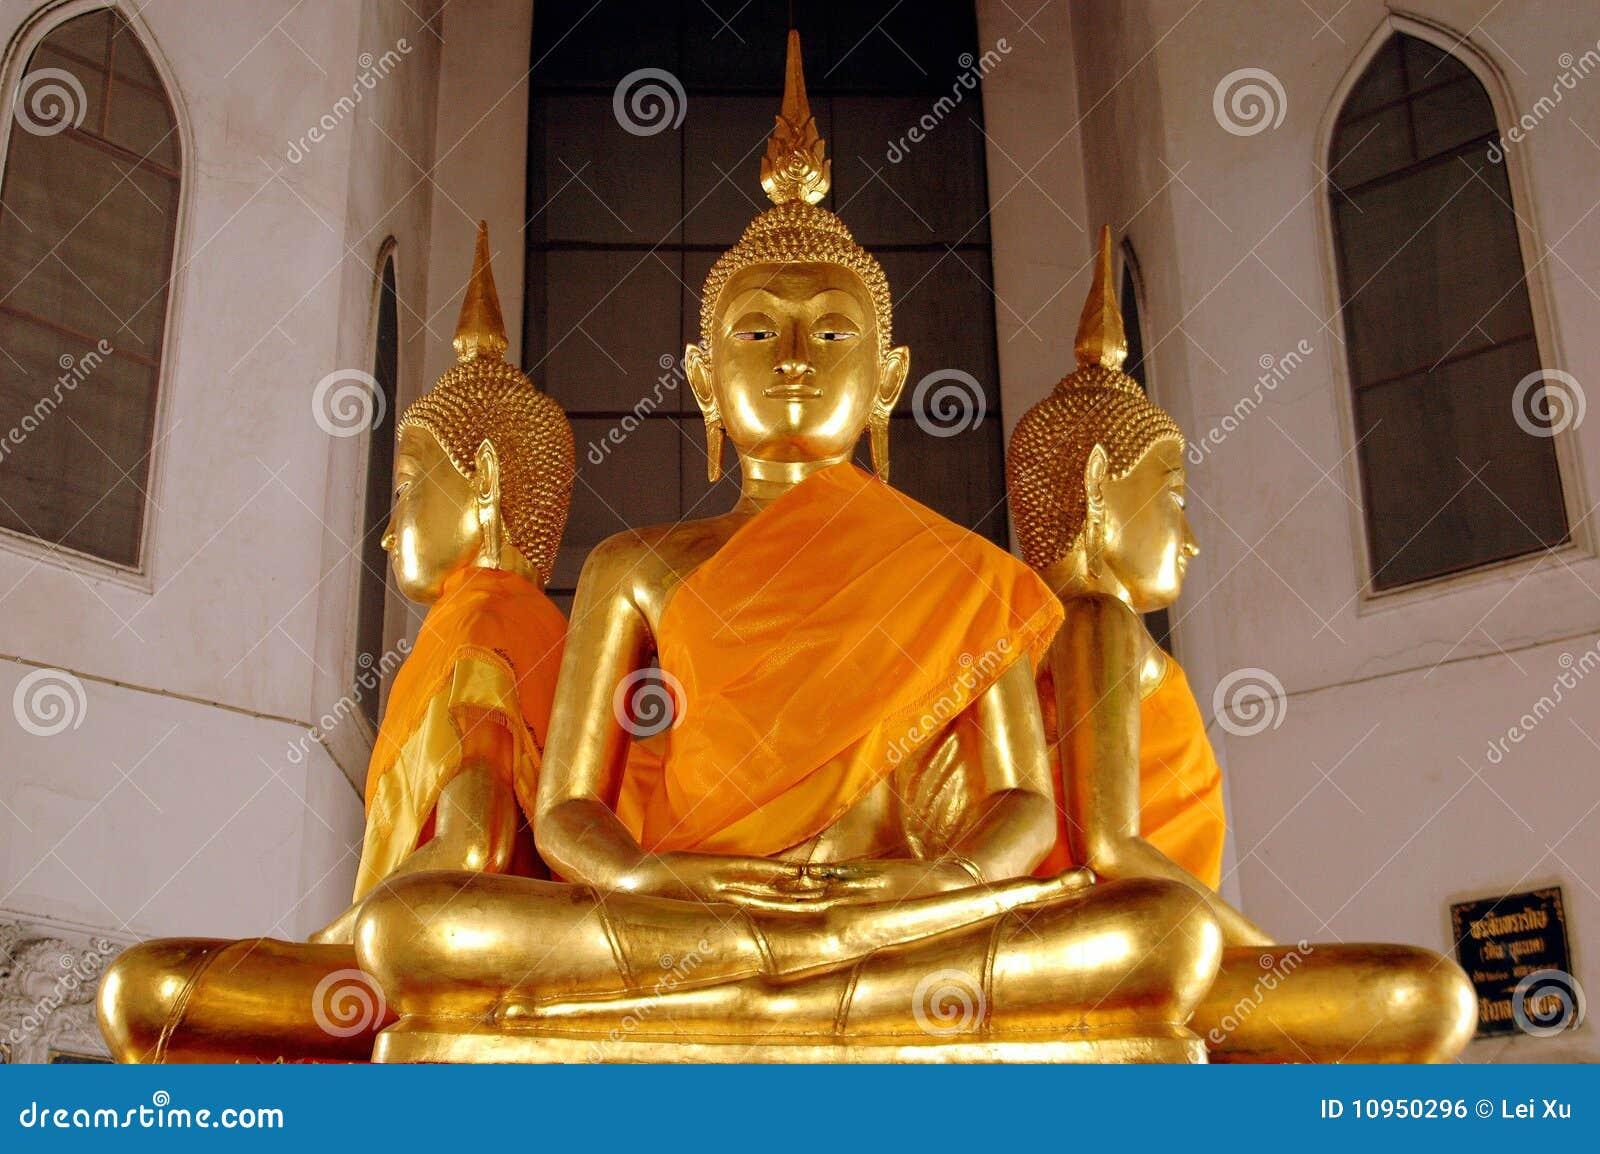 Bangkok, Thailand: Gilded Buddhas